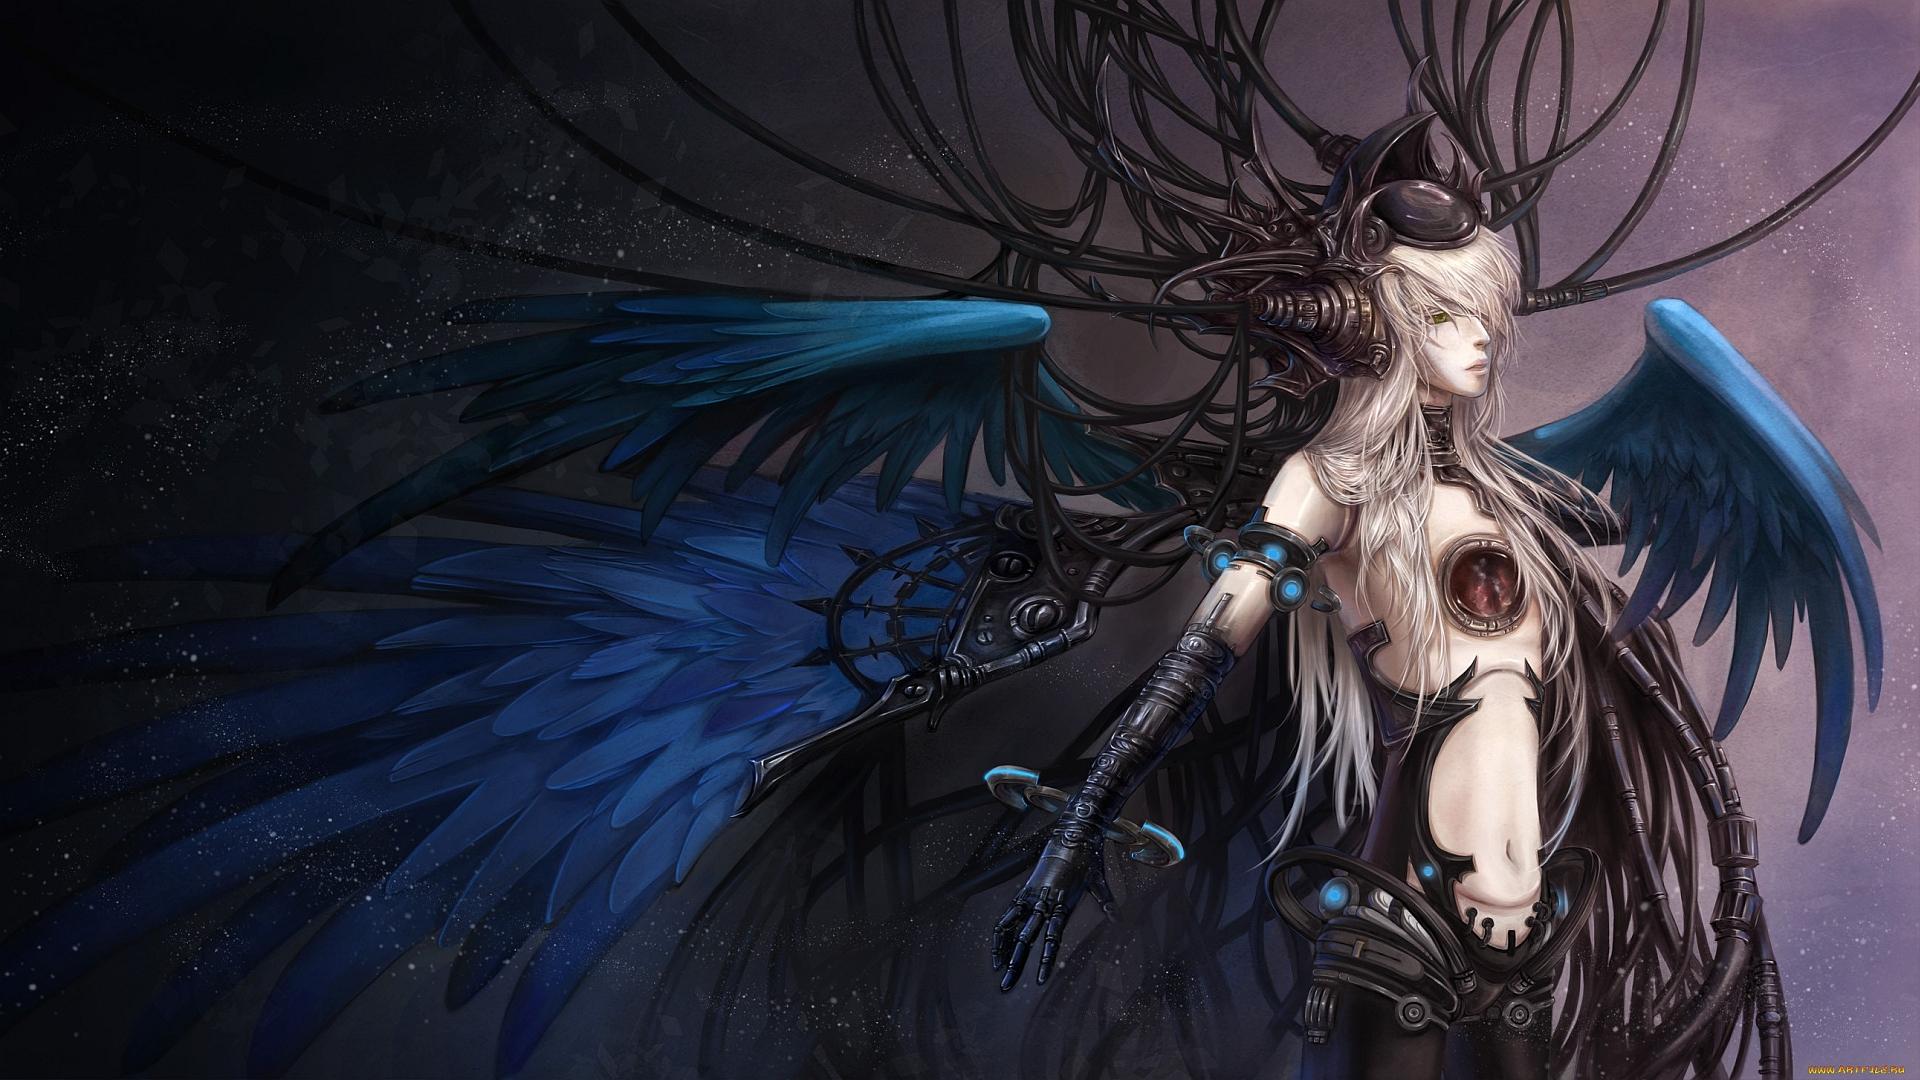 Image result for mechanical angel fantasyy art